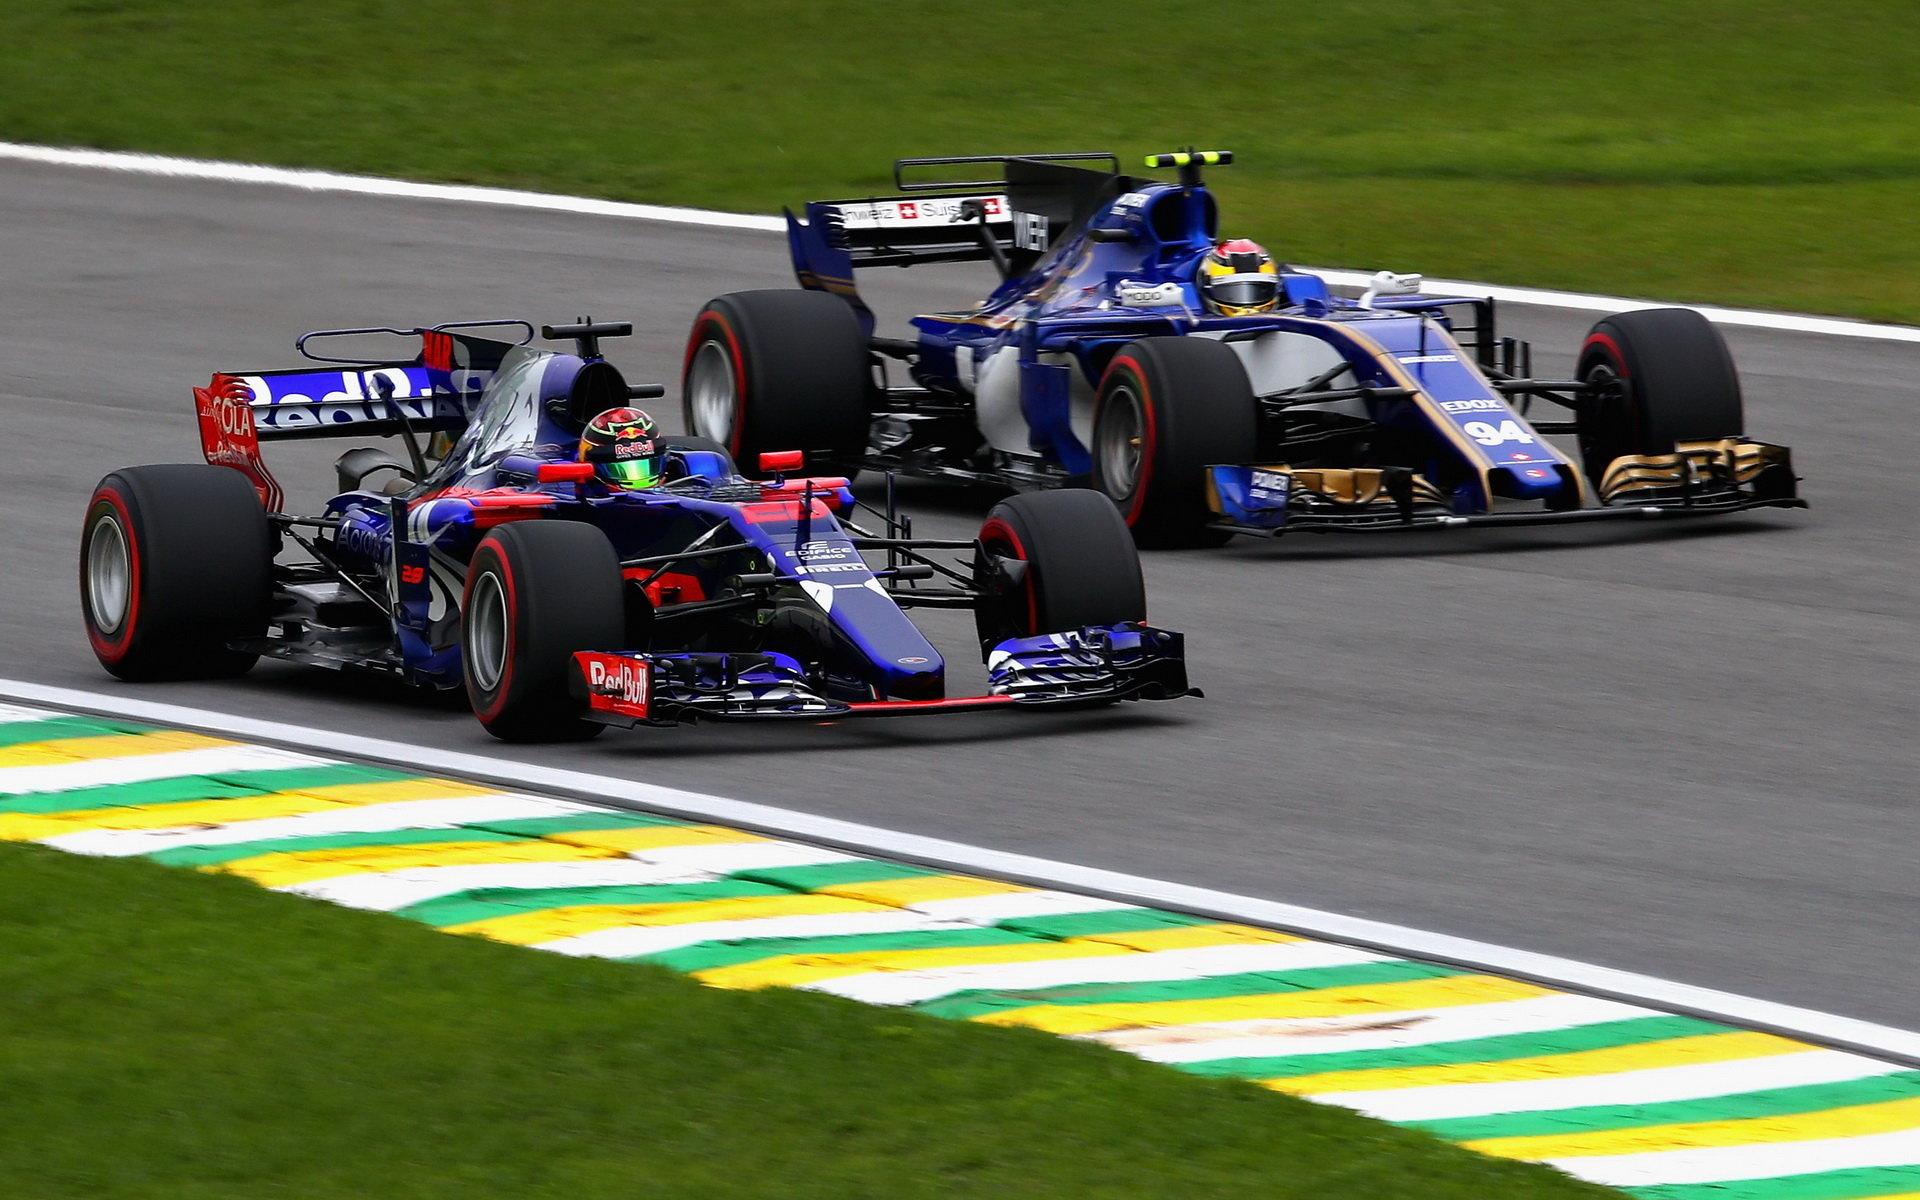 Brendon Hartley (Toro Rosso) v souboji s Pascalem Wehrleinem (Sauber) v Brazílii